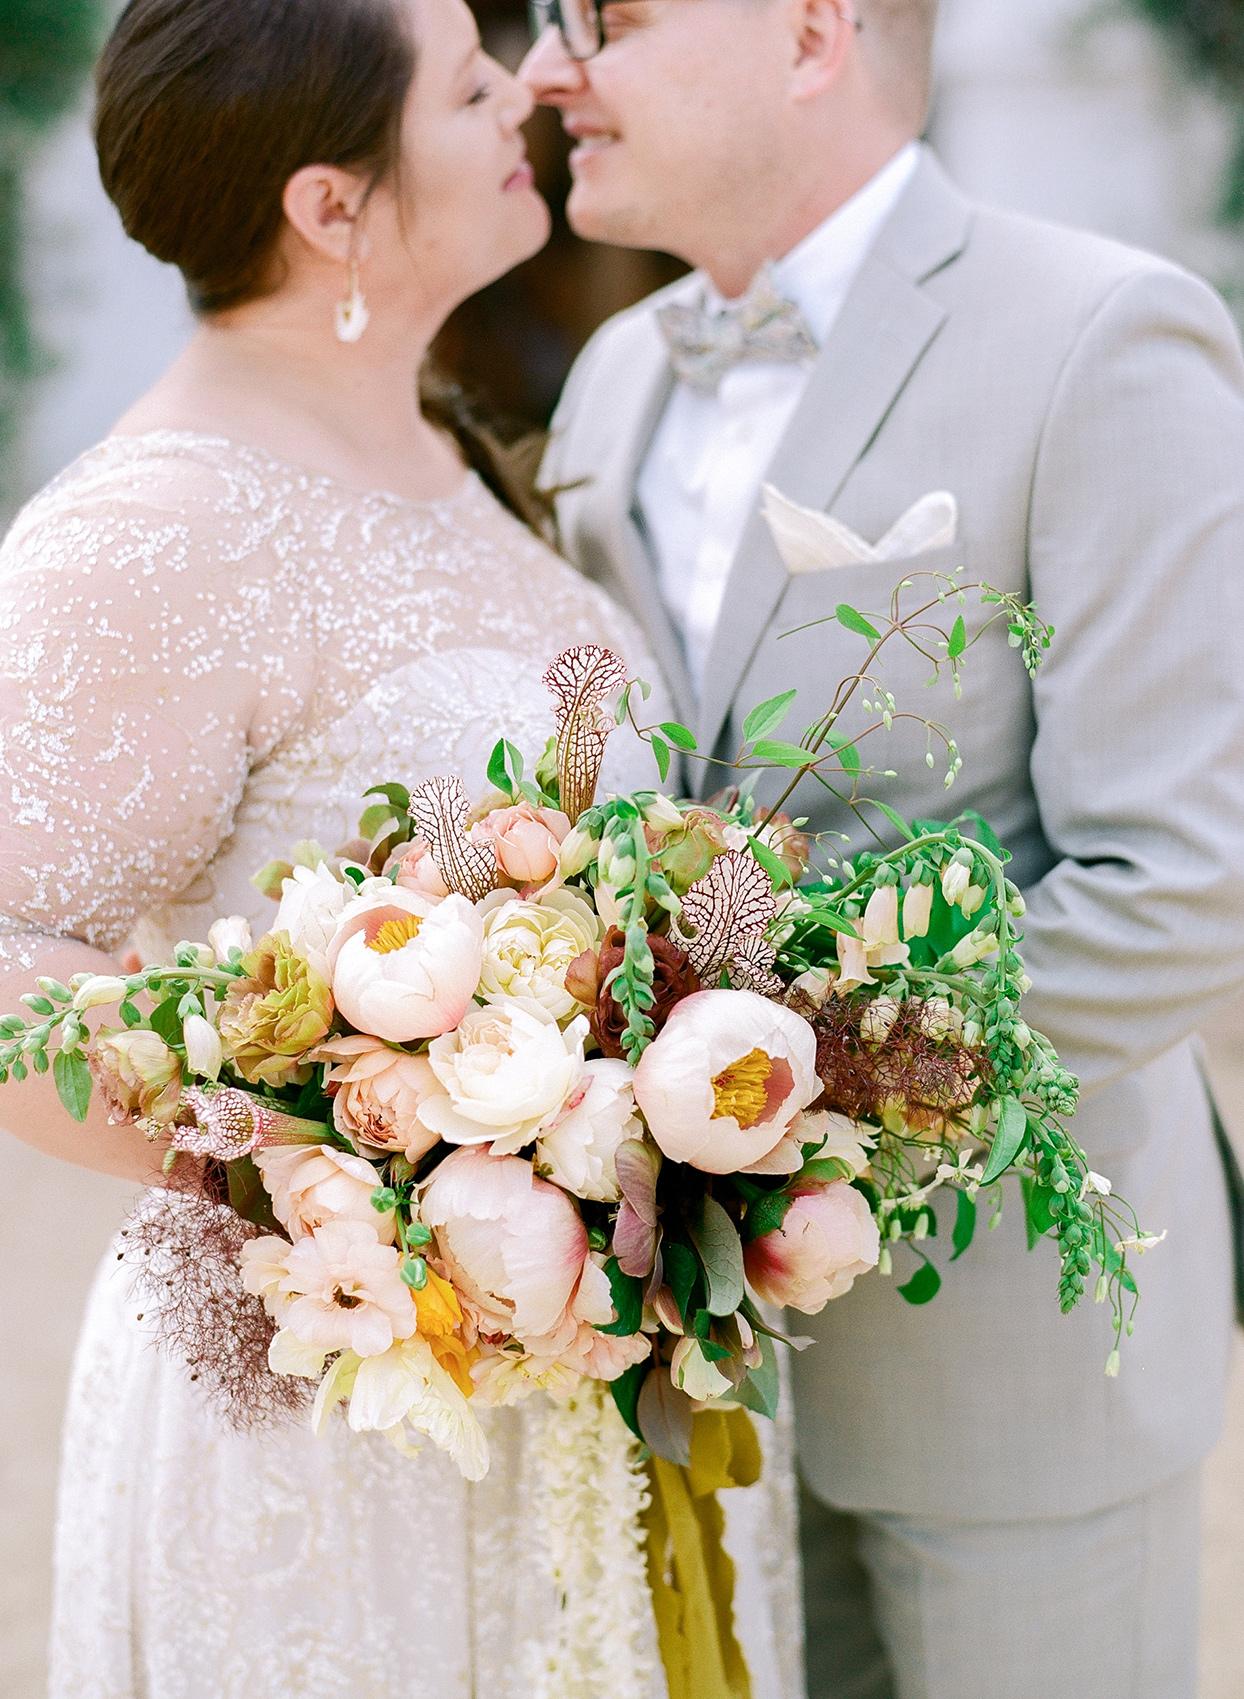 nina devon couple bride holding wedding bouquet